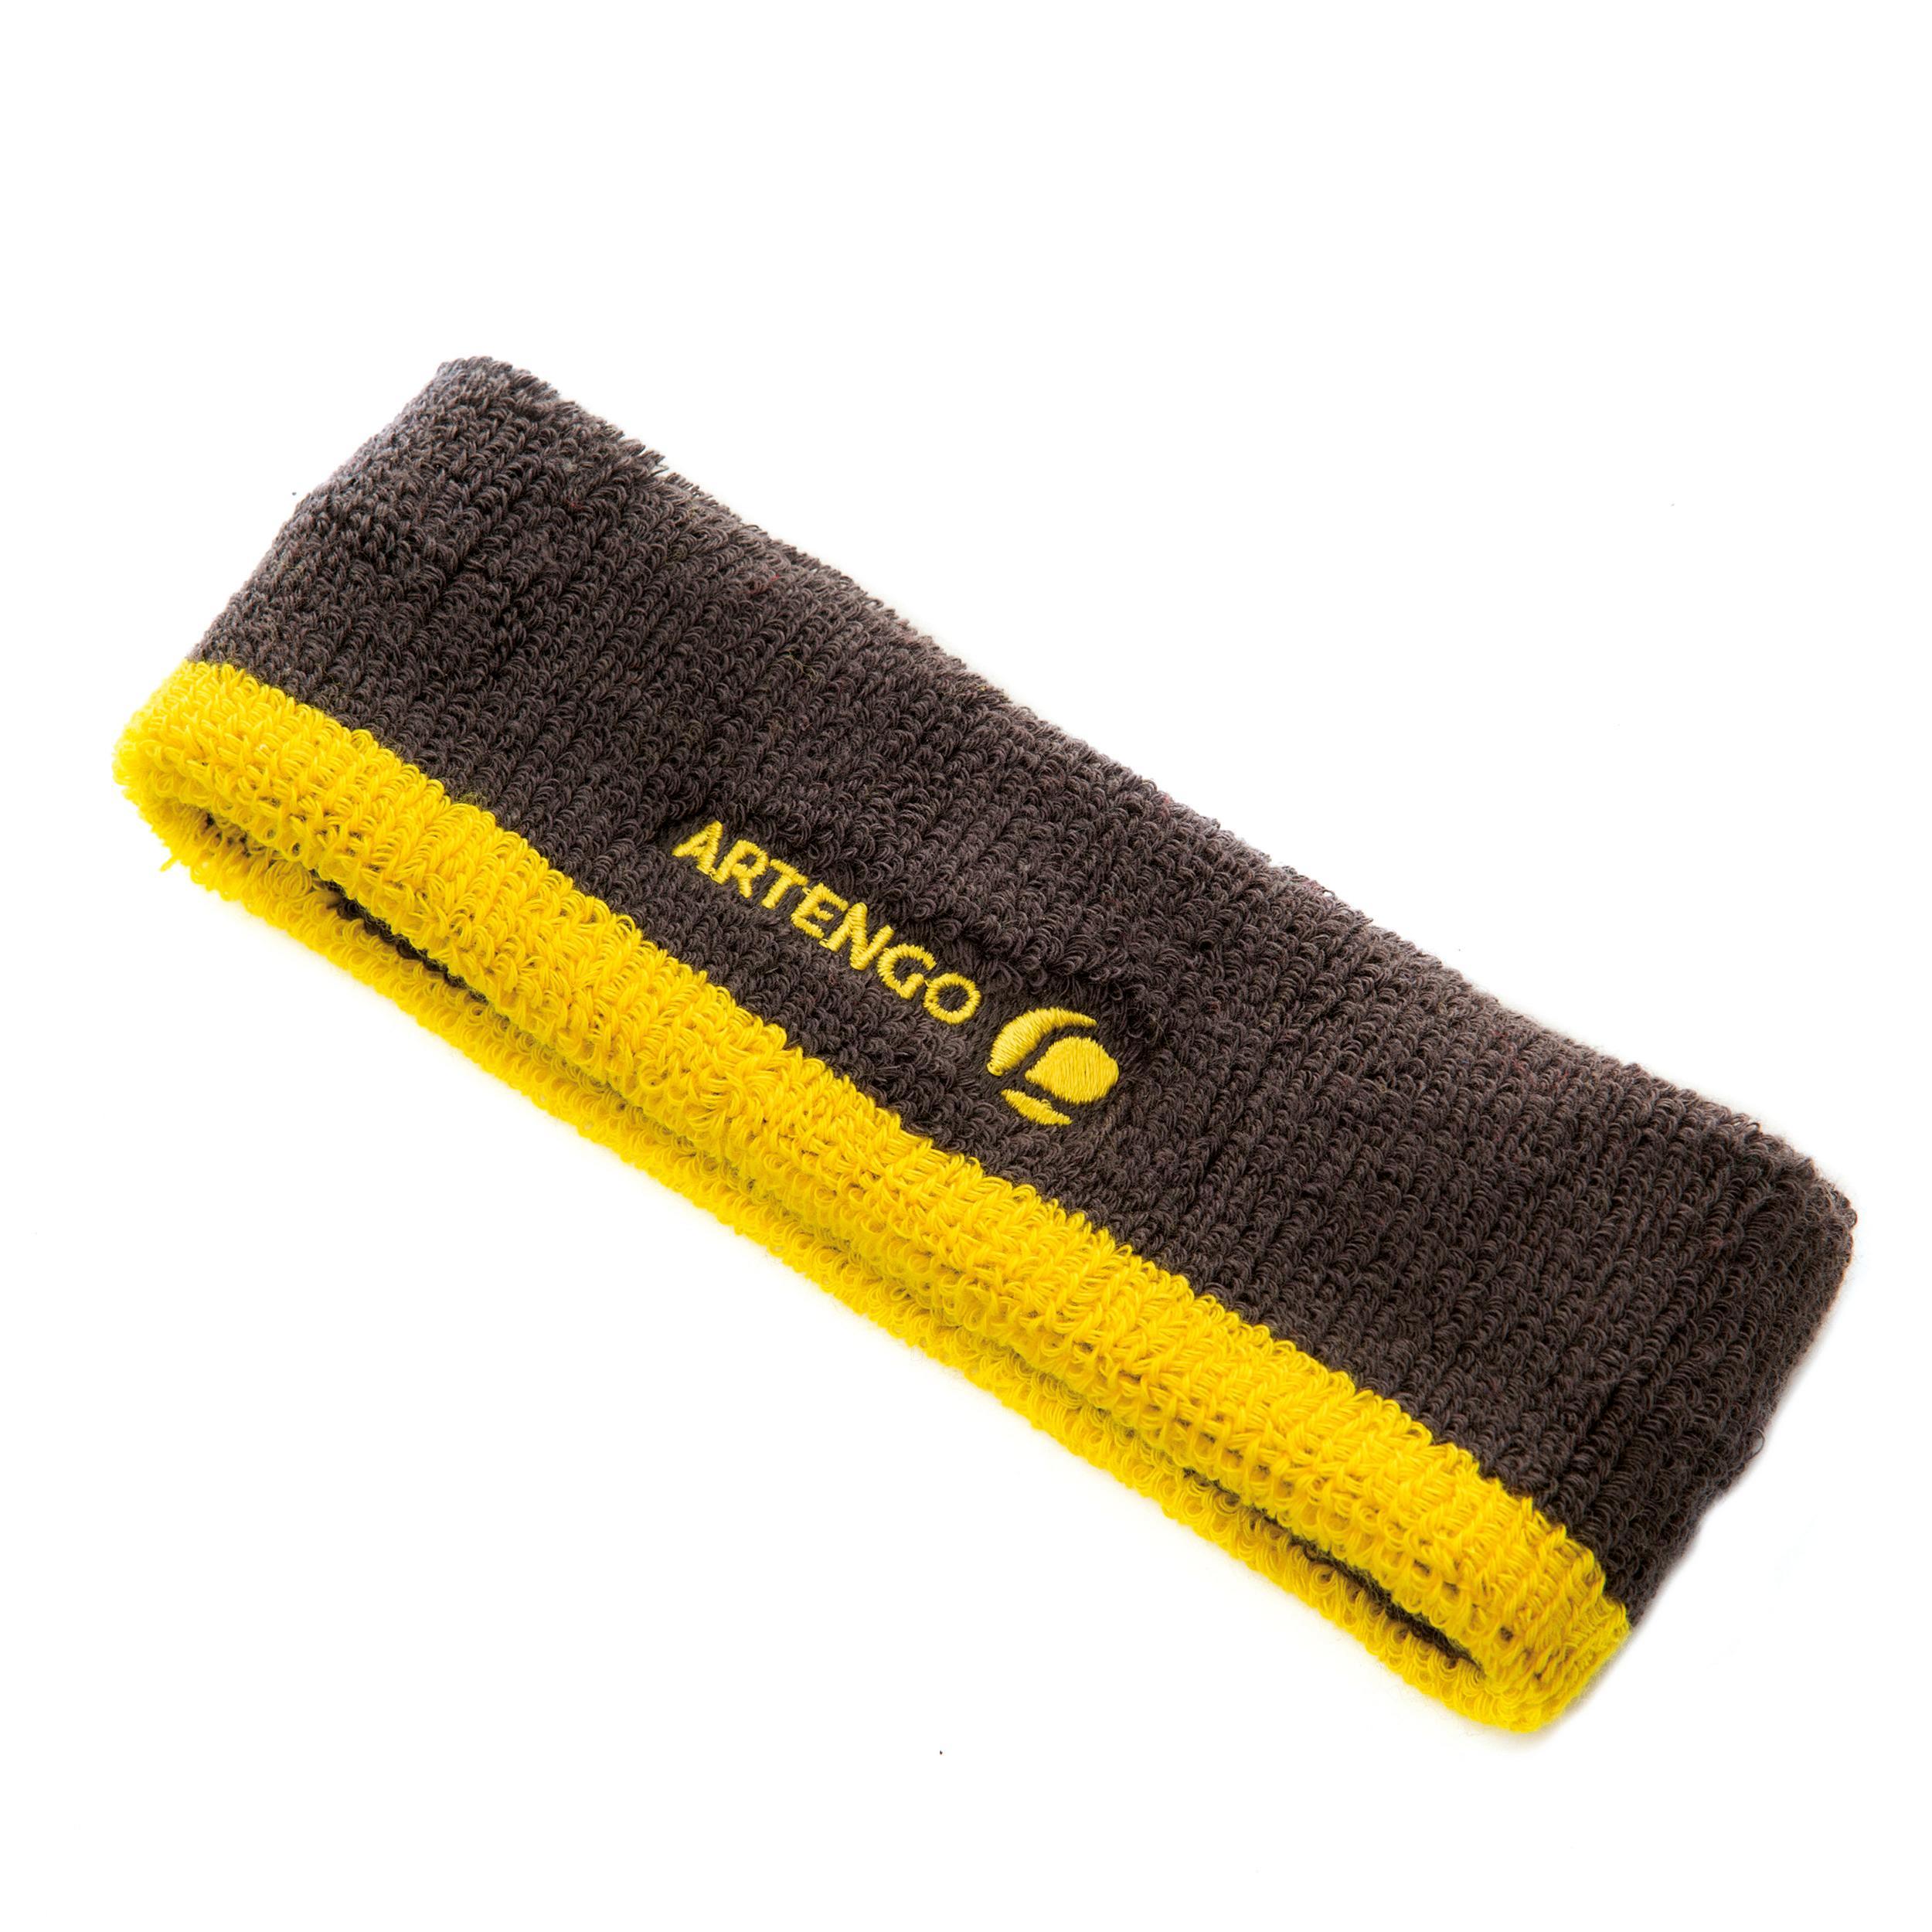 Headband - Grey/Yellow